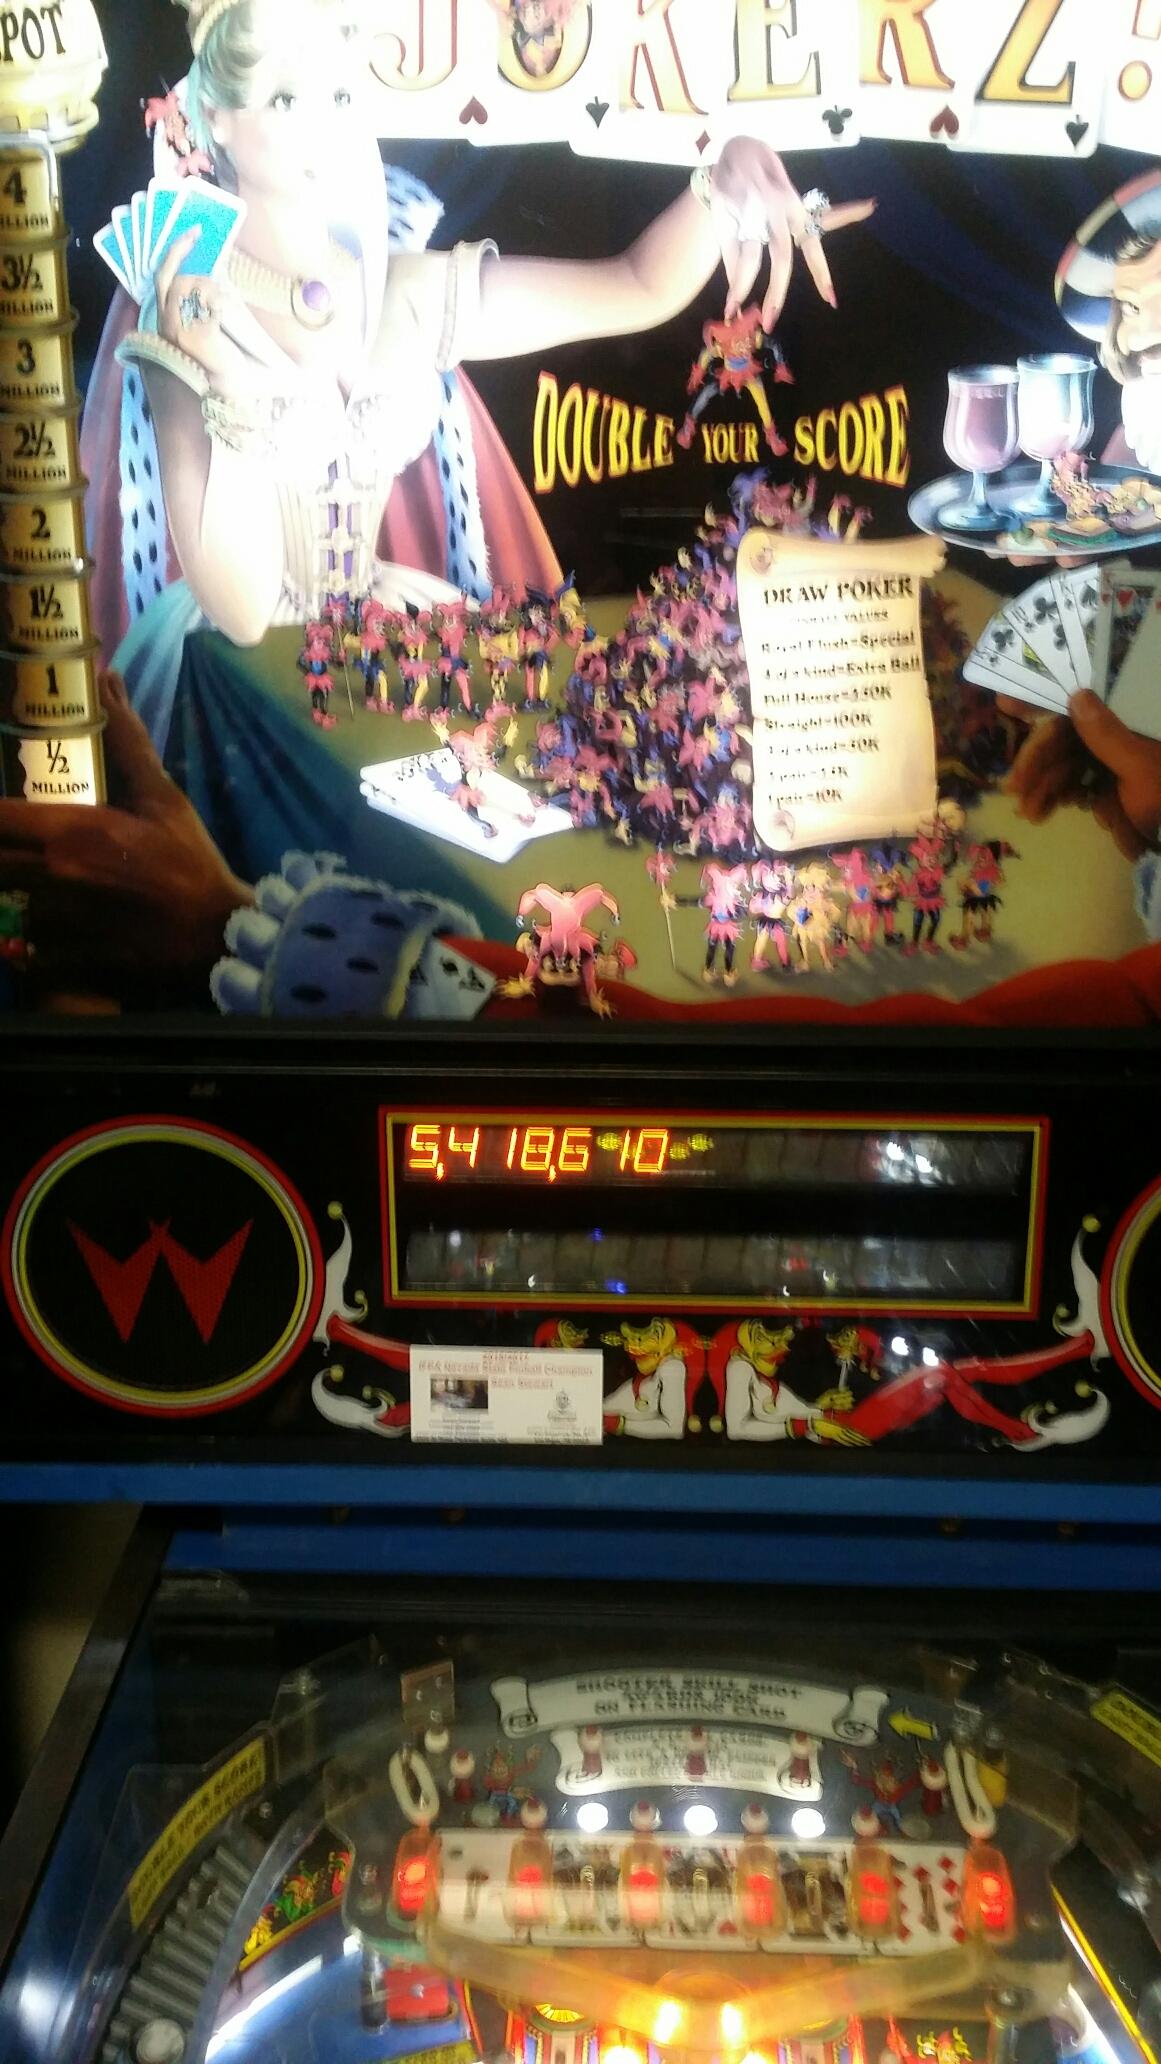 SeanStewart: Jokerz! (Pinball: 3 Balls) 5,418,610 points on 2017-05-08 18:02:22